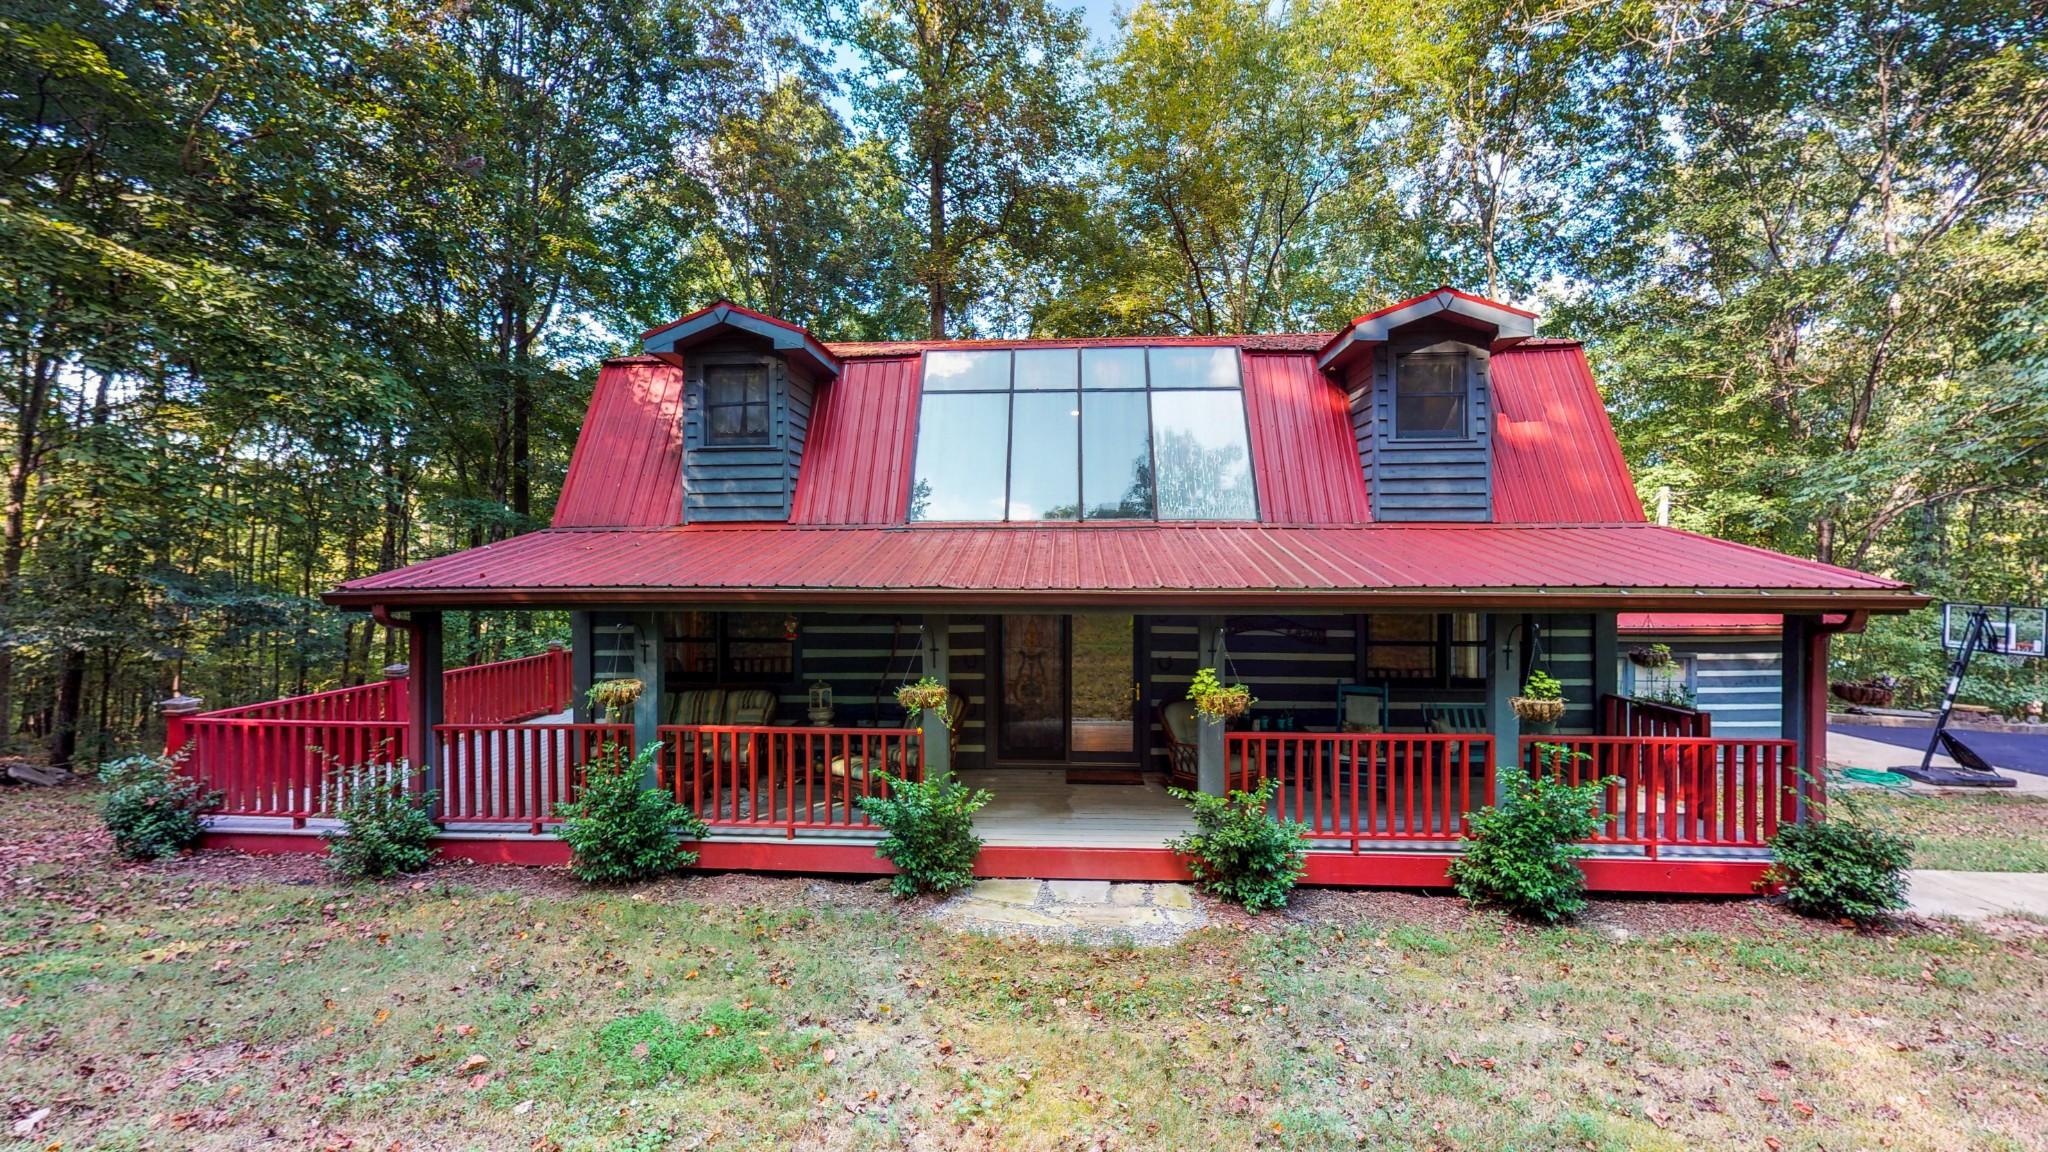 1010 Bald Eagle Dr, Kingston Springs, TN 37082 - Kingston Springs, TN real estate listing